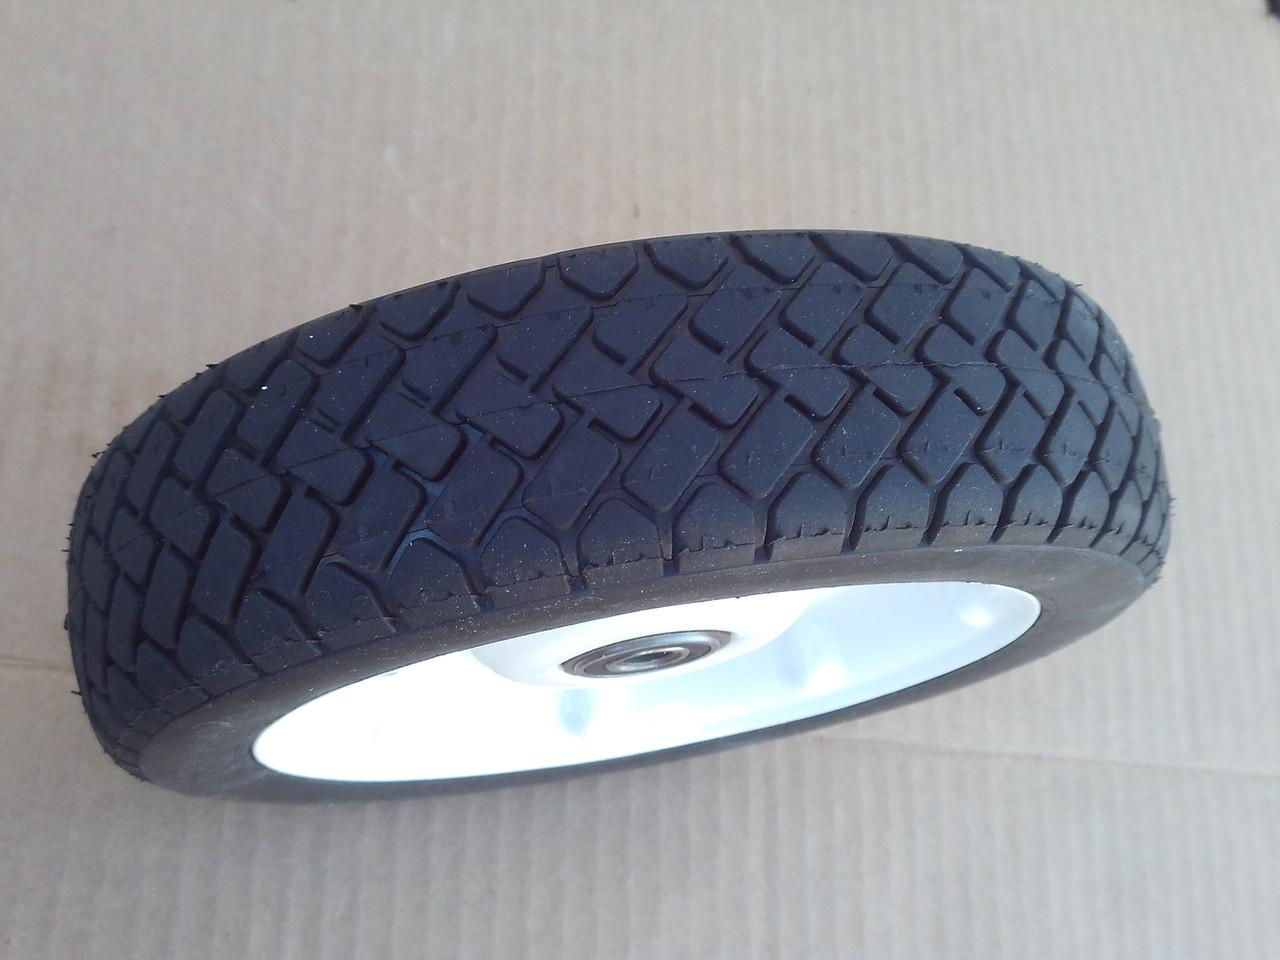 Drive Wheel for Exmark Metro 21, 1002860, 1211379, 100-2860, 121-1379 Self Propelled